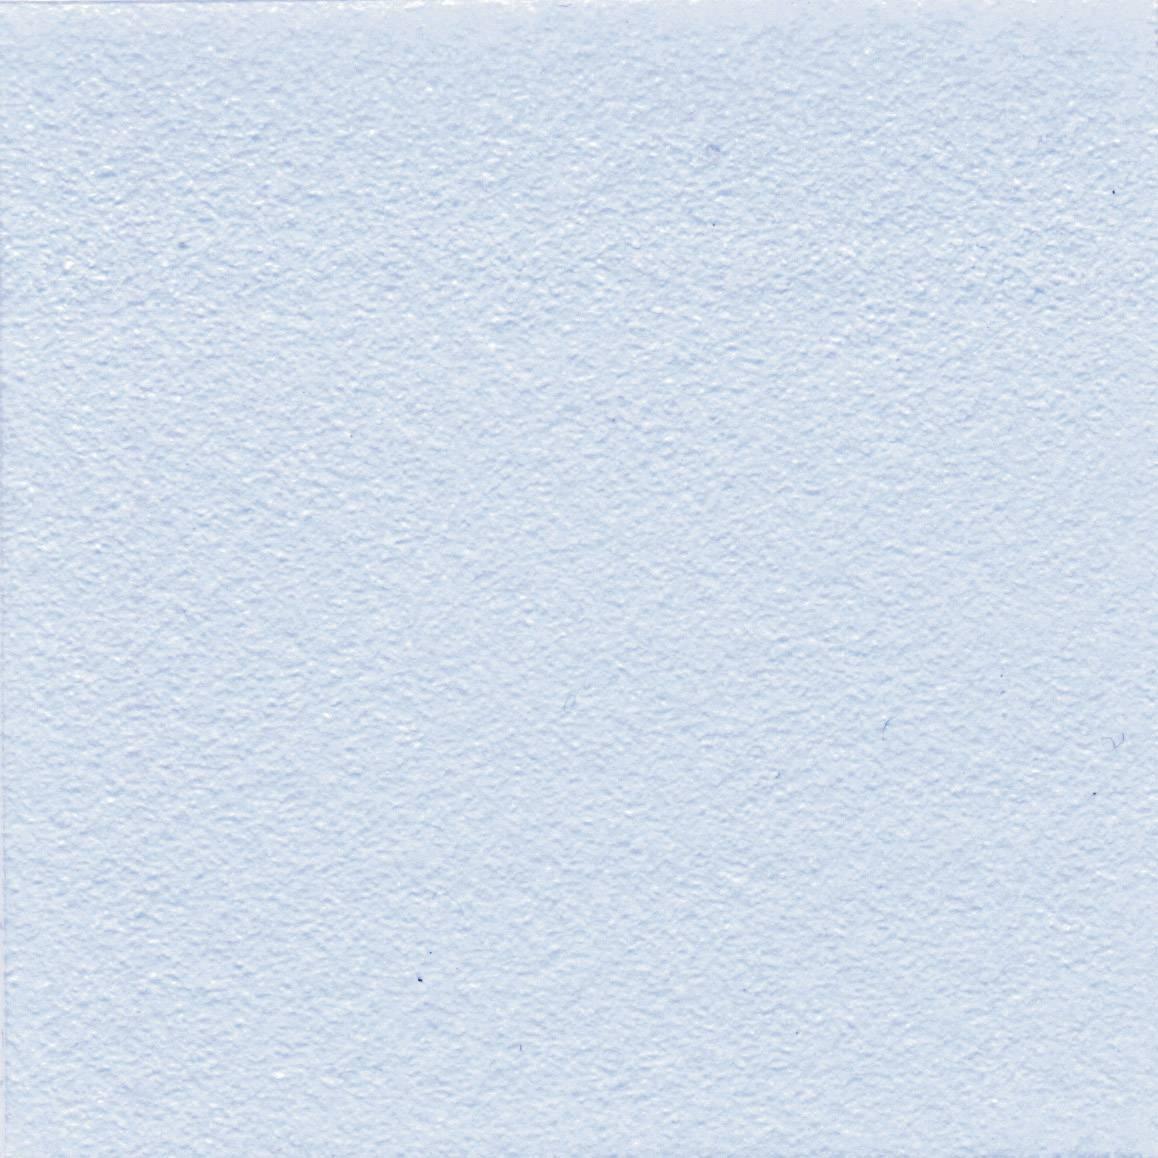 Teplovodivá fólia Kerafol SOFTTHERM 86/300, 3 mm, 3 W/mK, (d x š) 50 mm x 50 mm